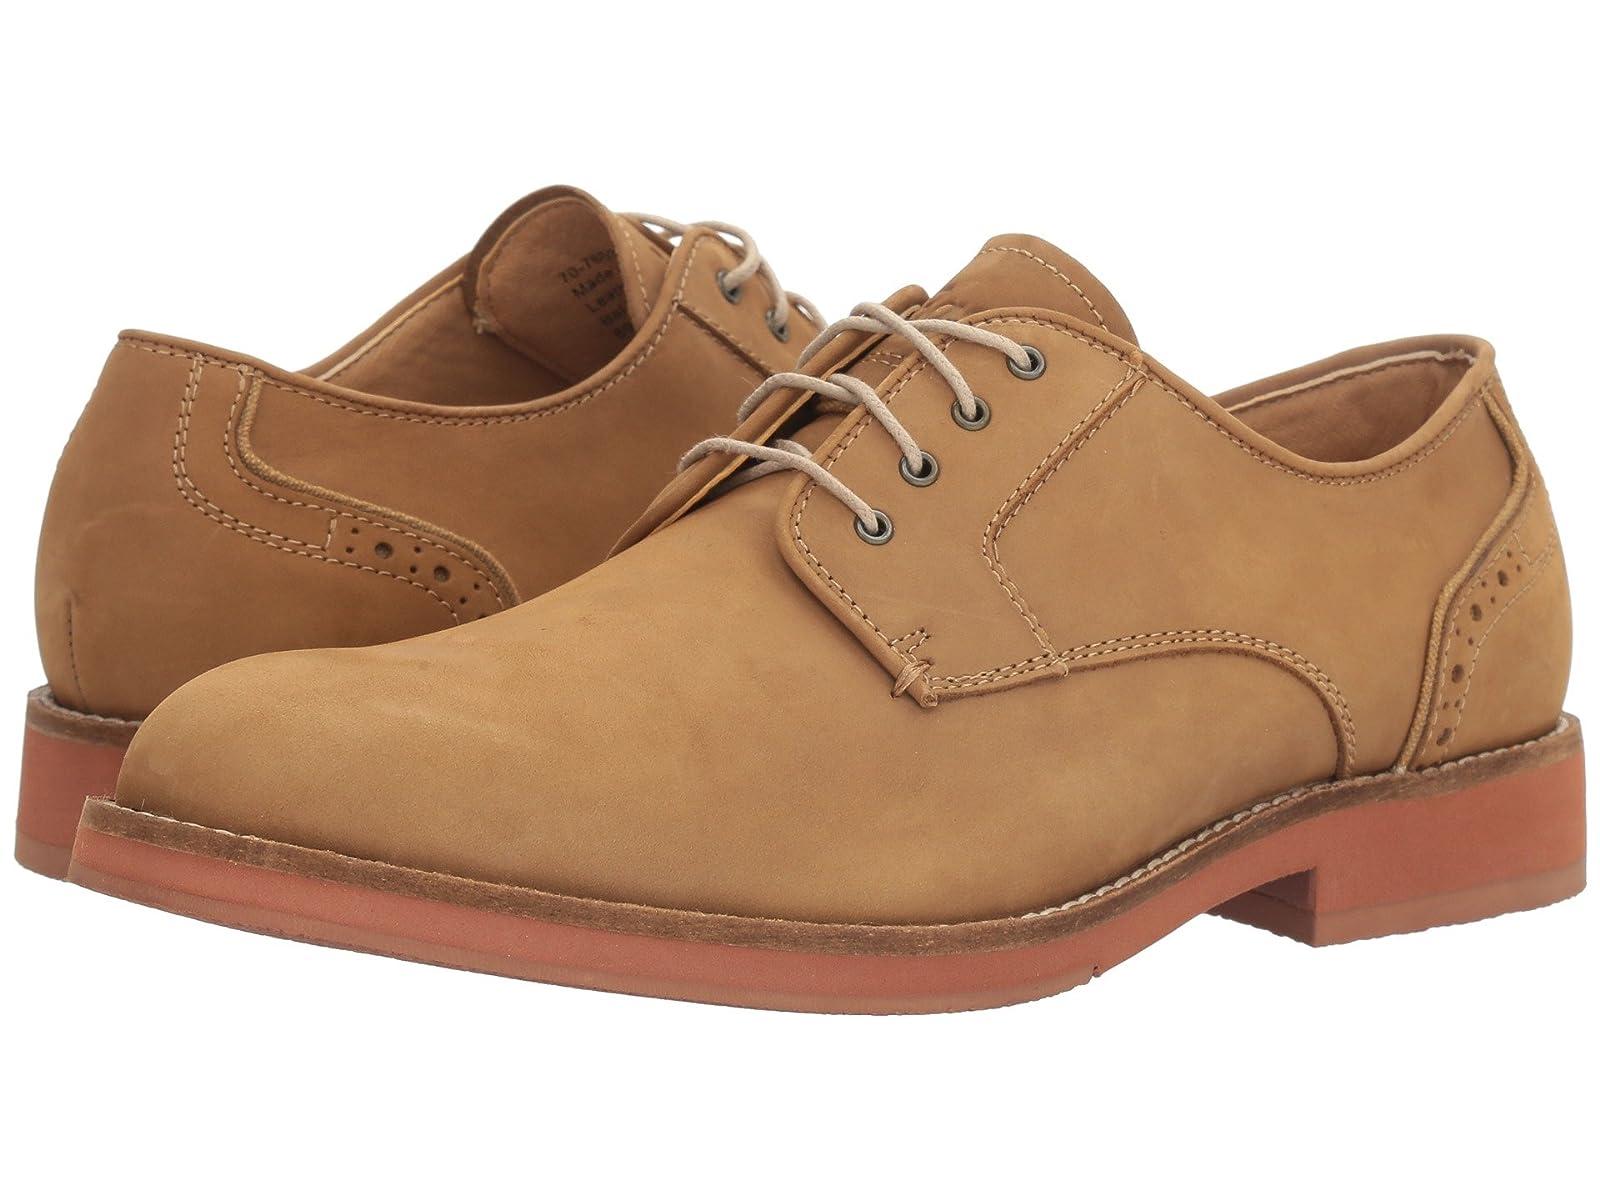 G.H. Bass & Co. NilesCheap and distinctive eye-catching shoes